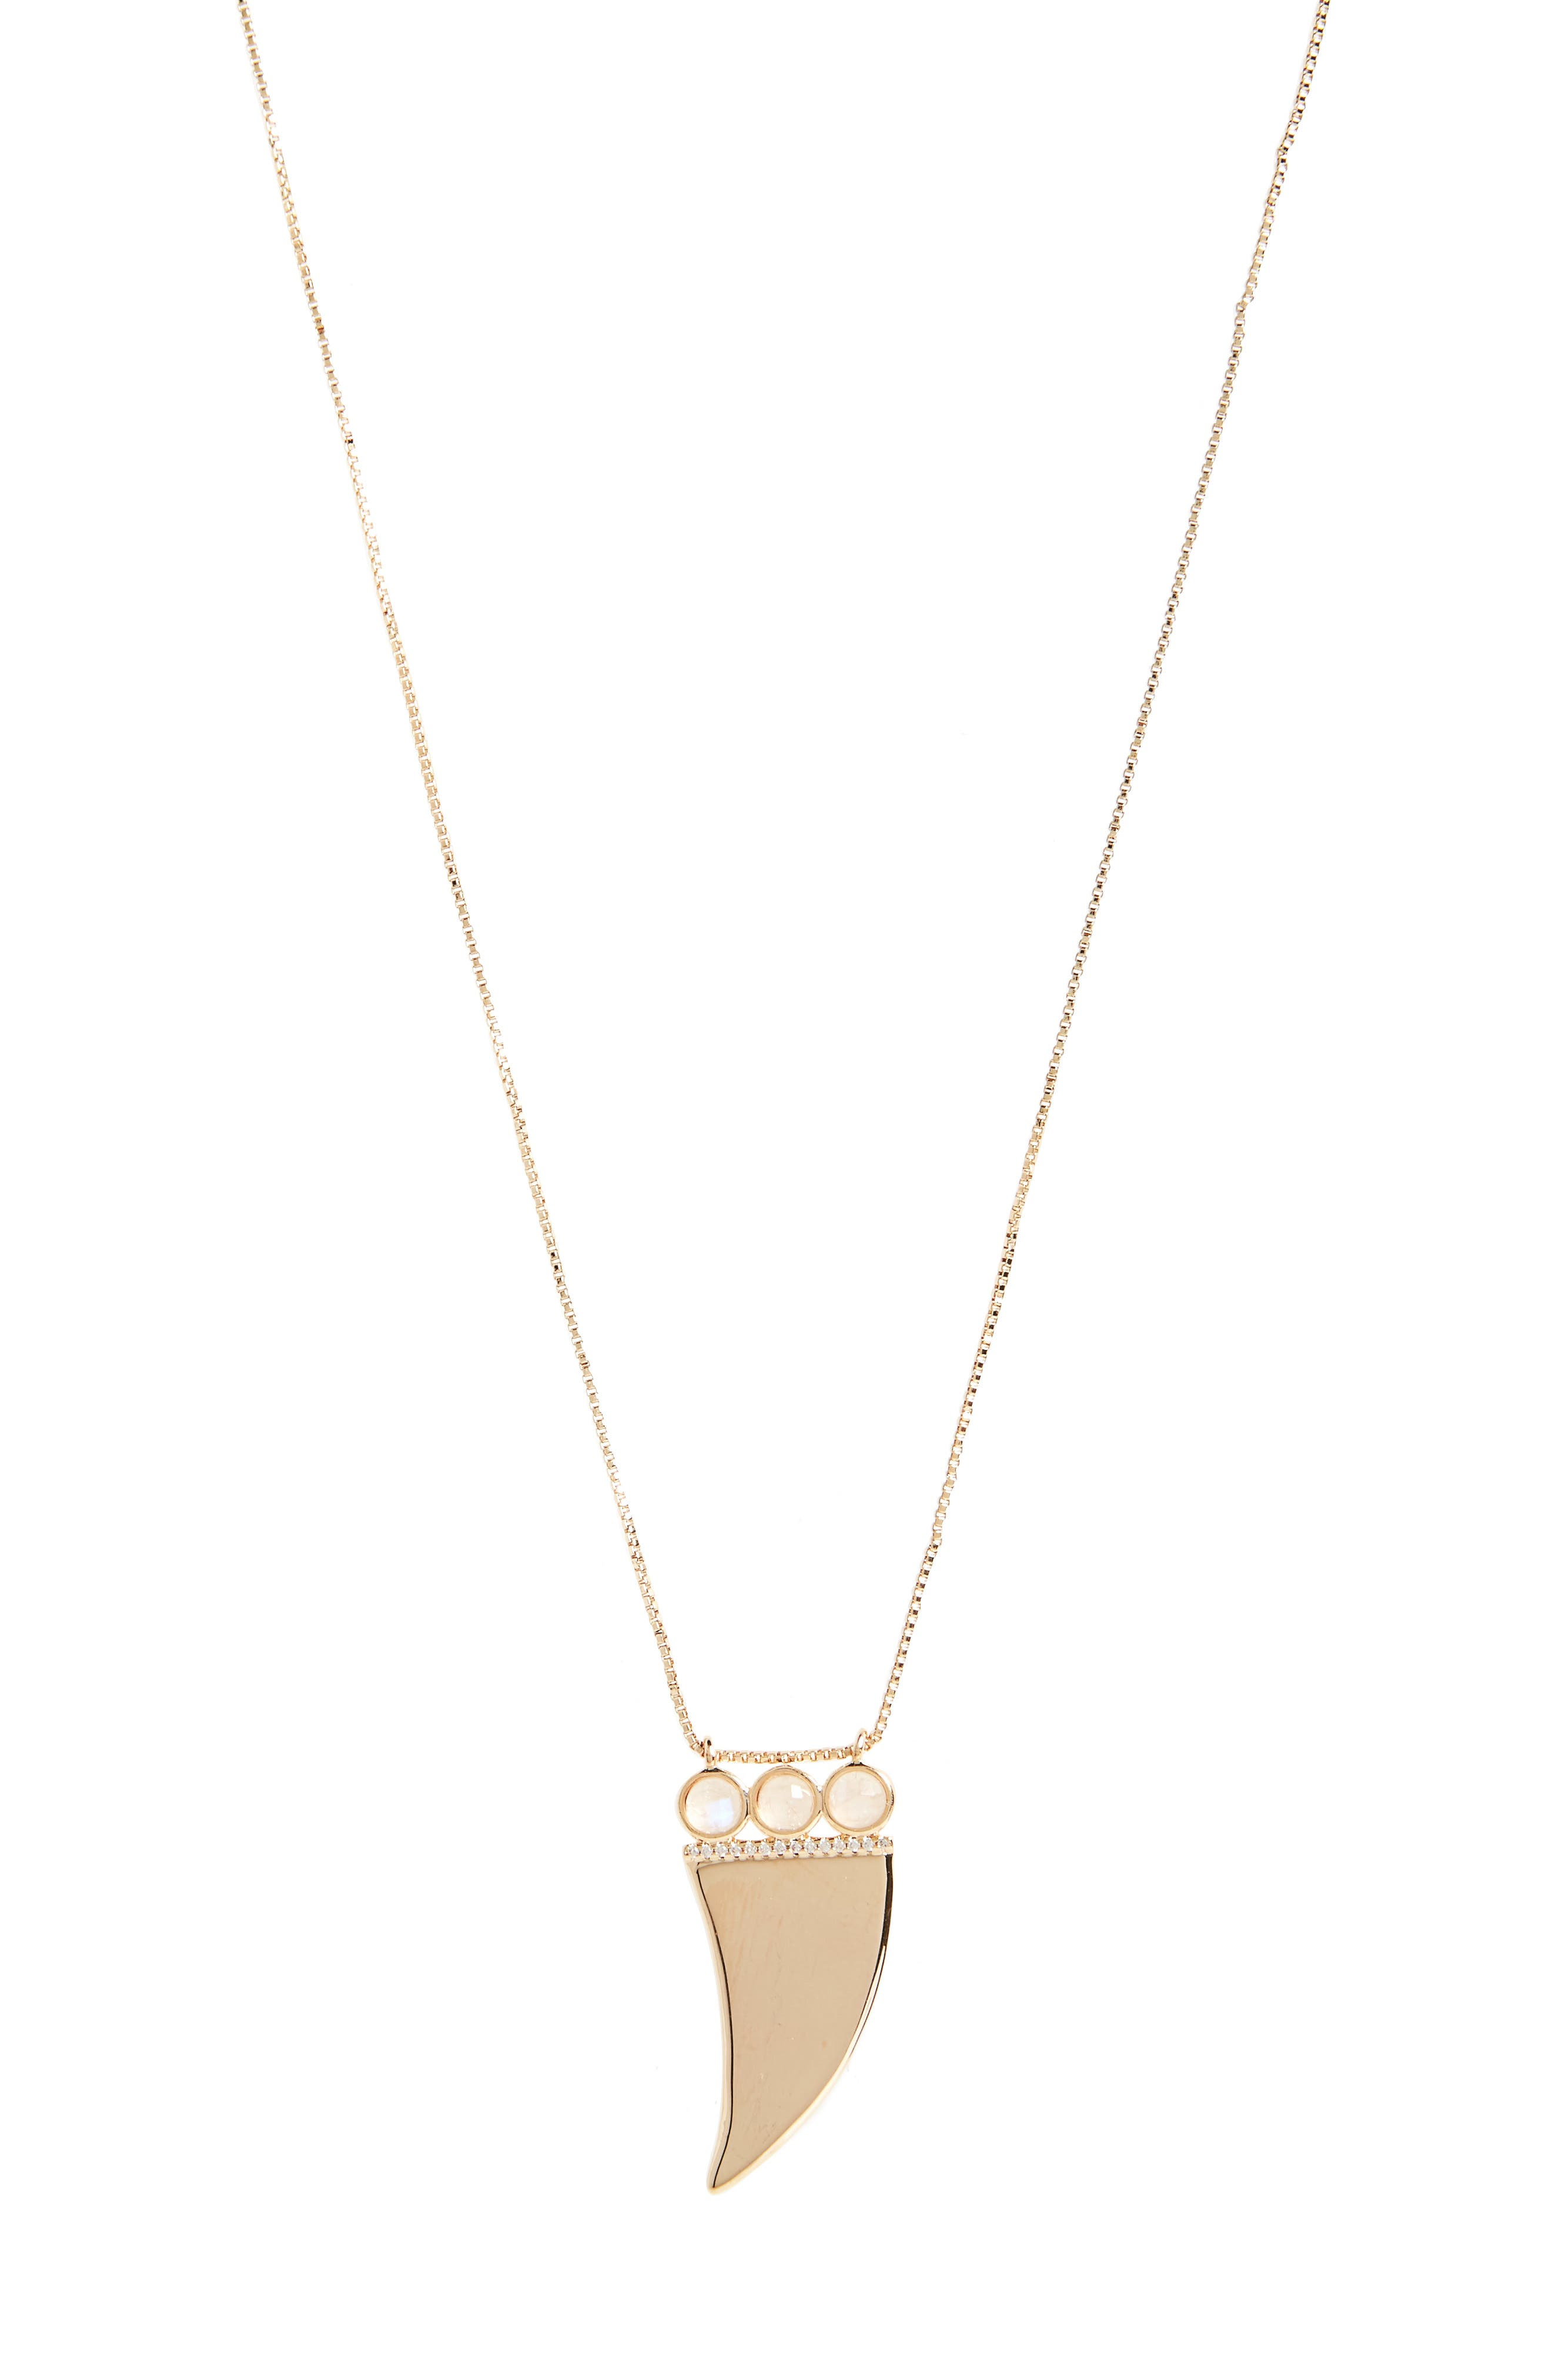 Hendrix Horn Pendant Necklace,                             Main thumbnail 1, color,                             MOONSTONE/ GOLD